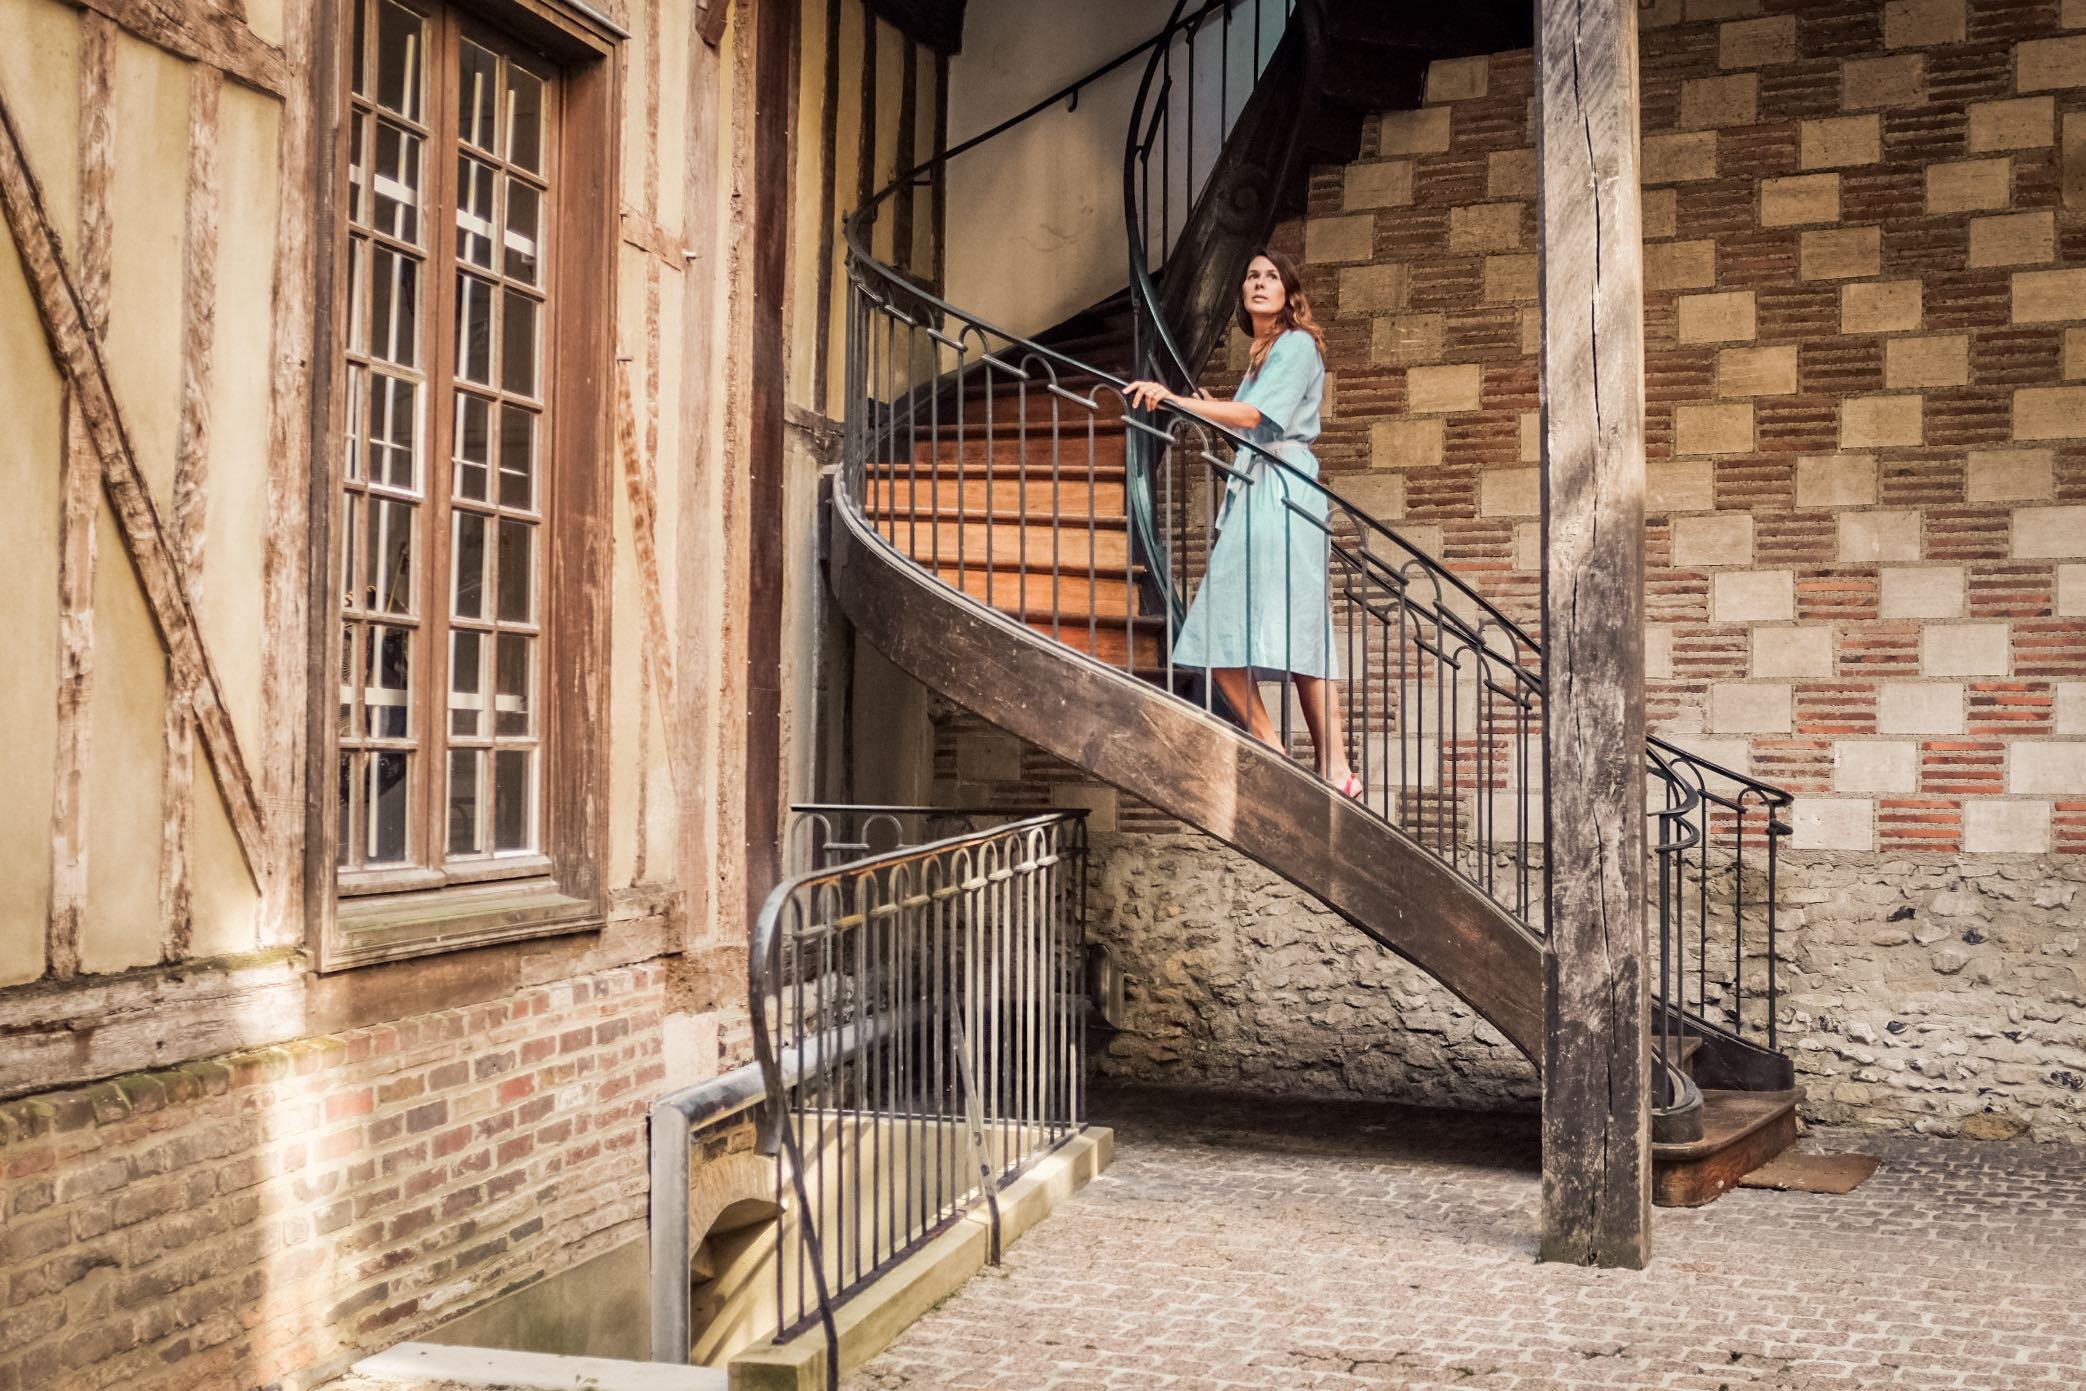 Visita a Troyes: scala a chiocciola in corte interna